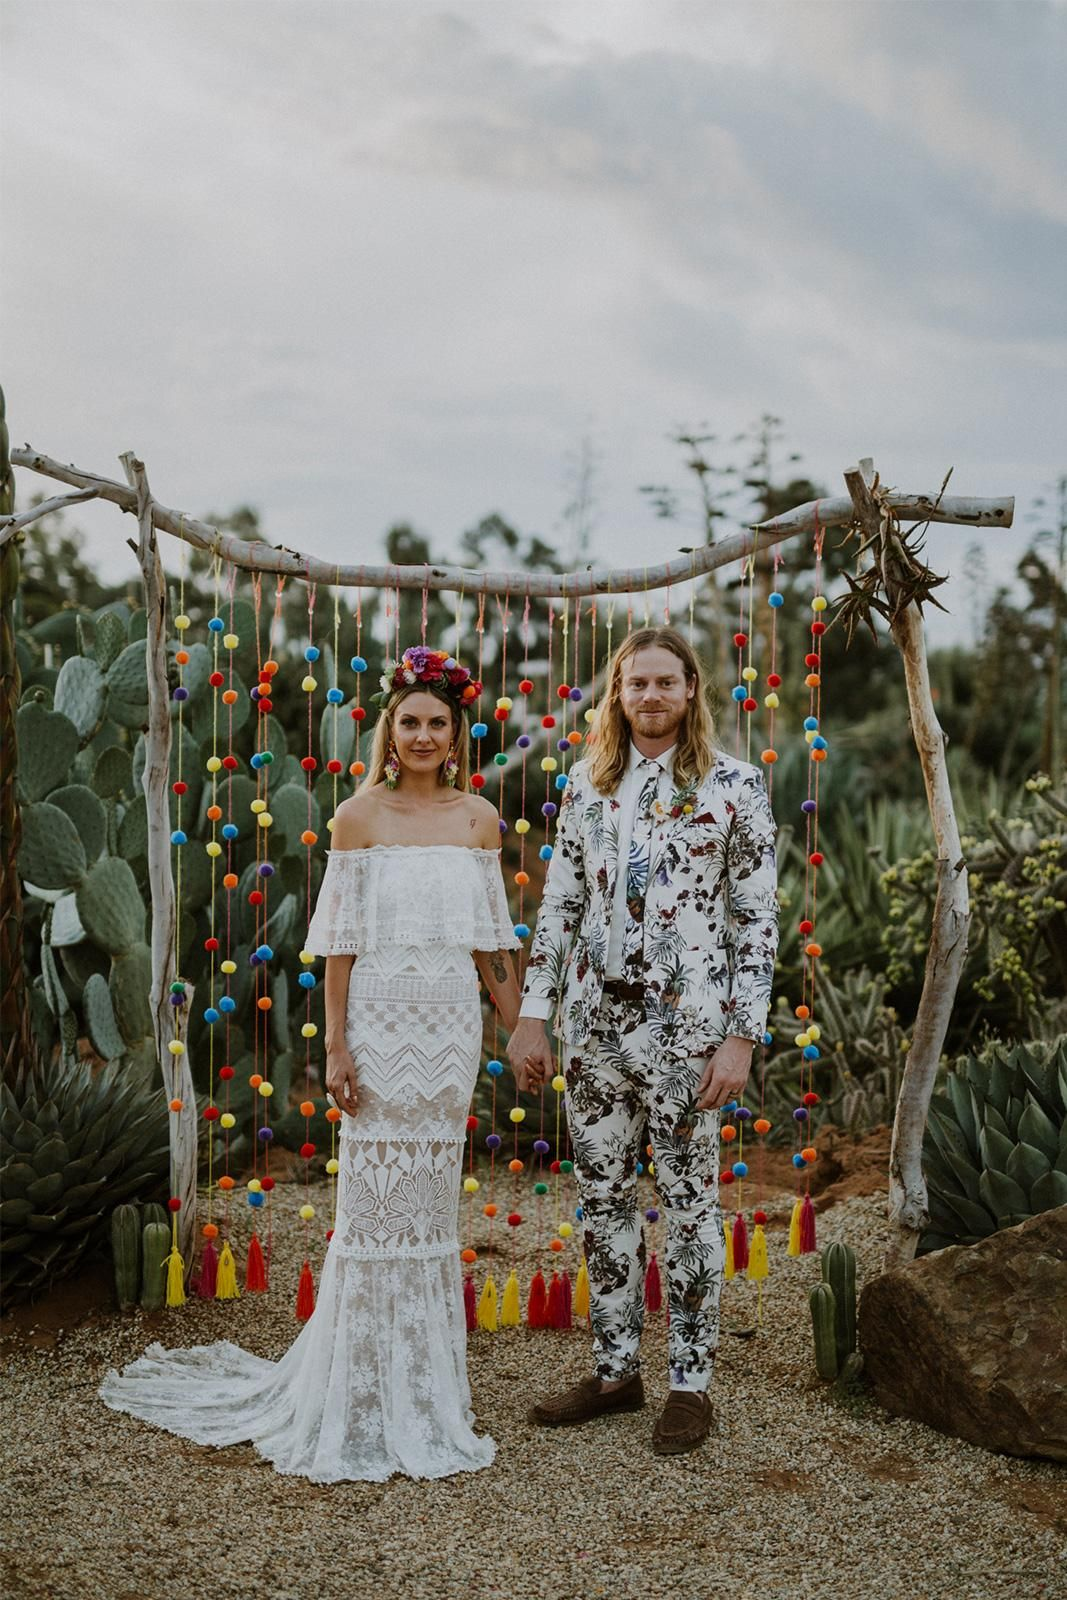 Emanuela Gown Lace Wedding Dress Wedding dresses perth